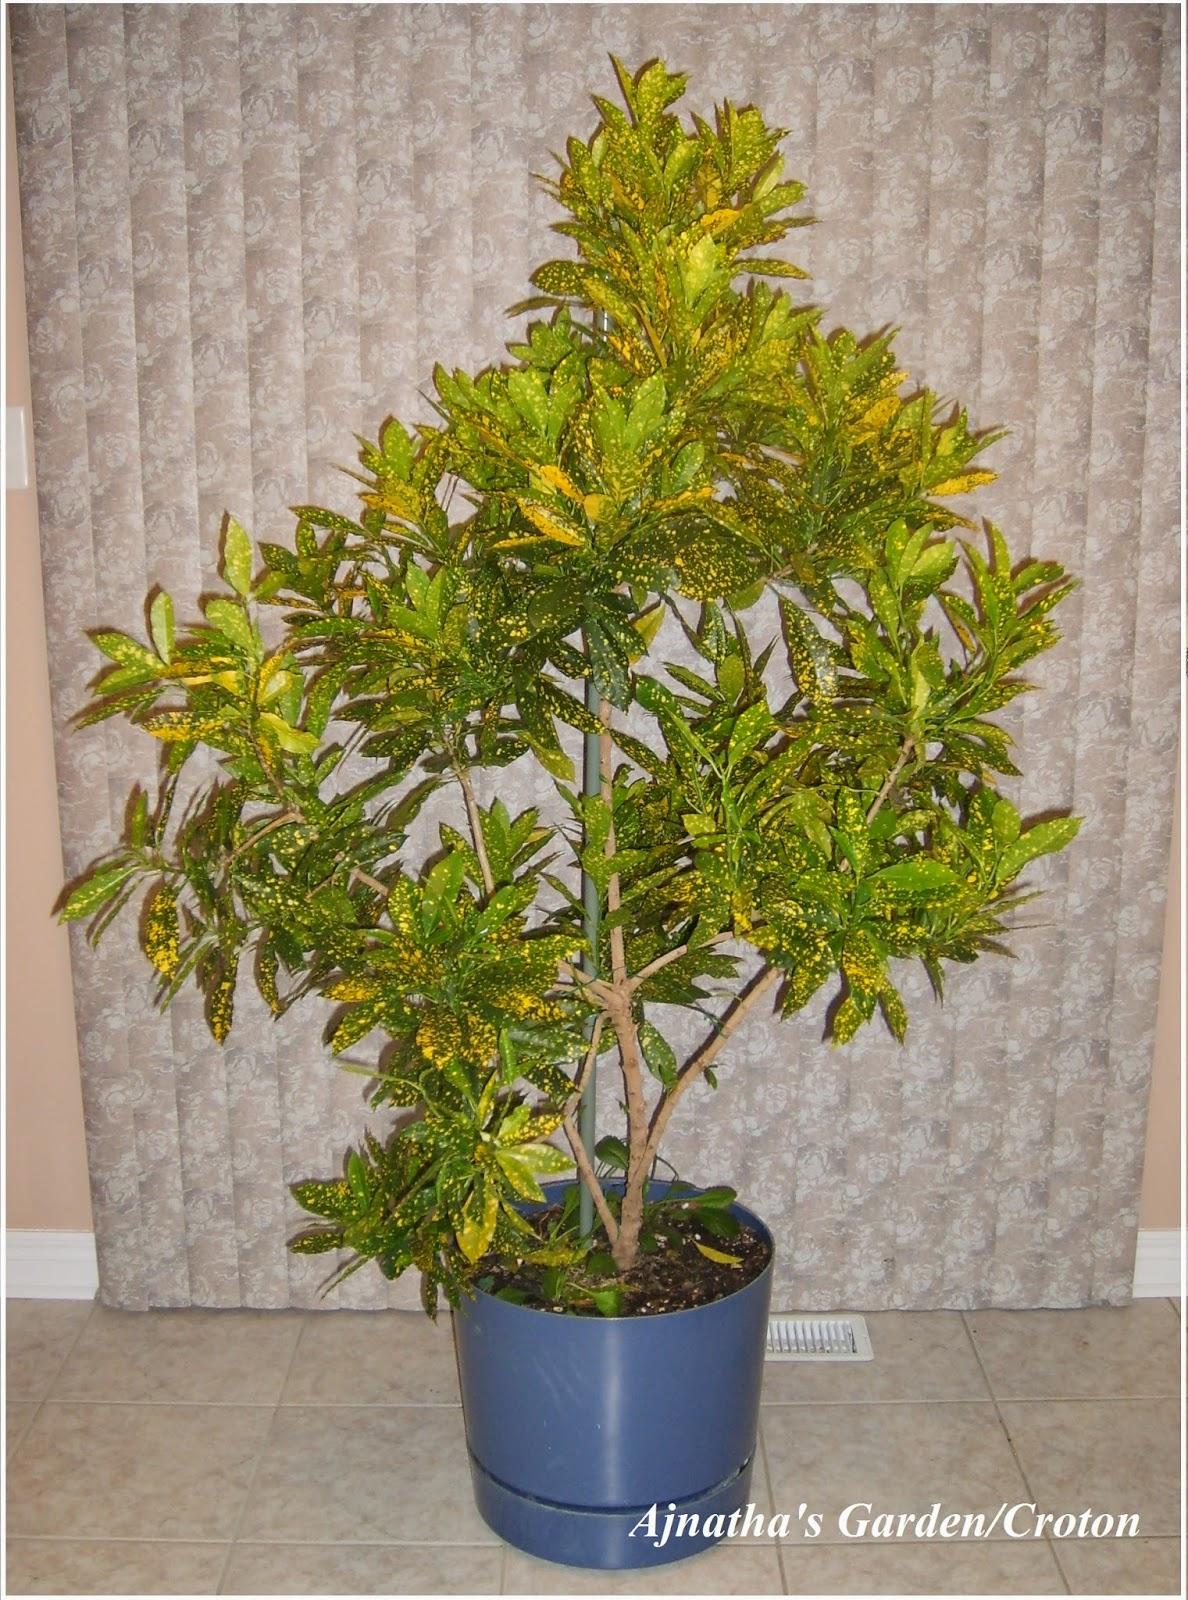 Ajantha's Garden/Gold Dust-Croton